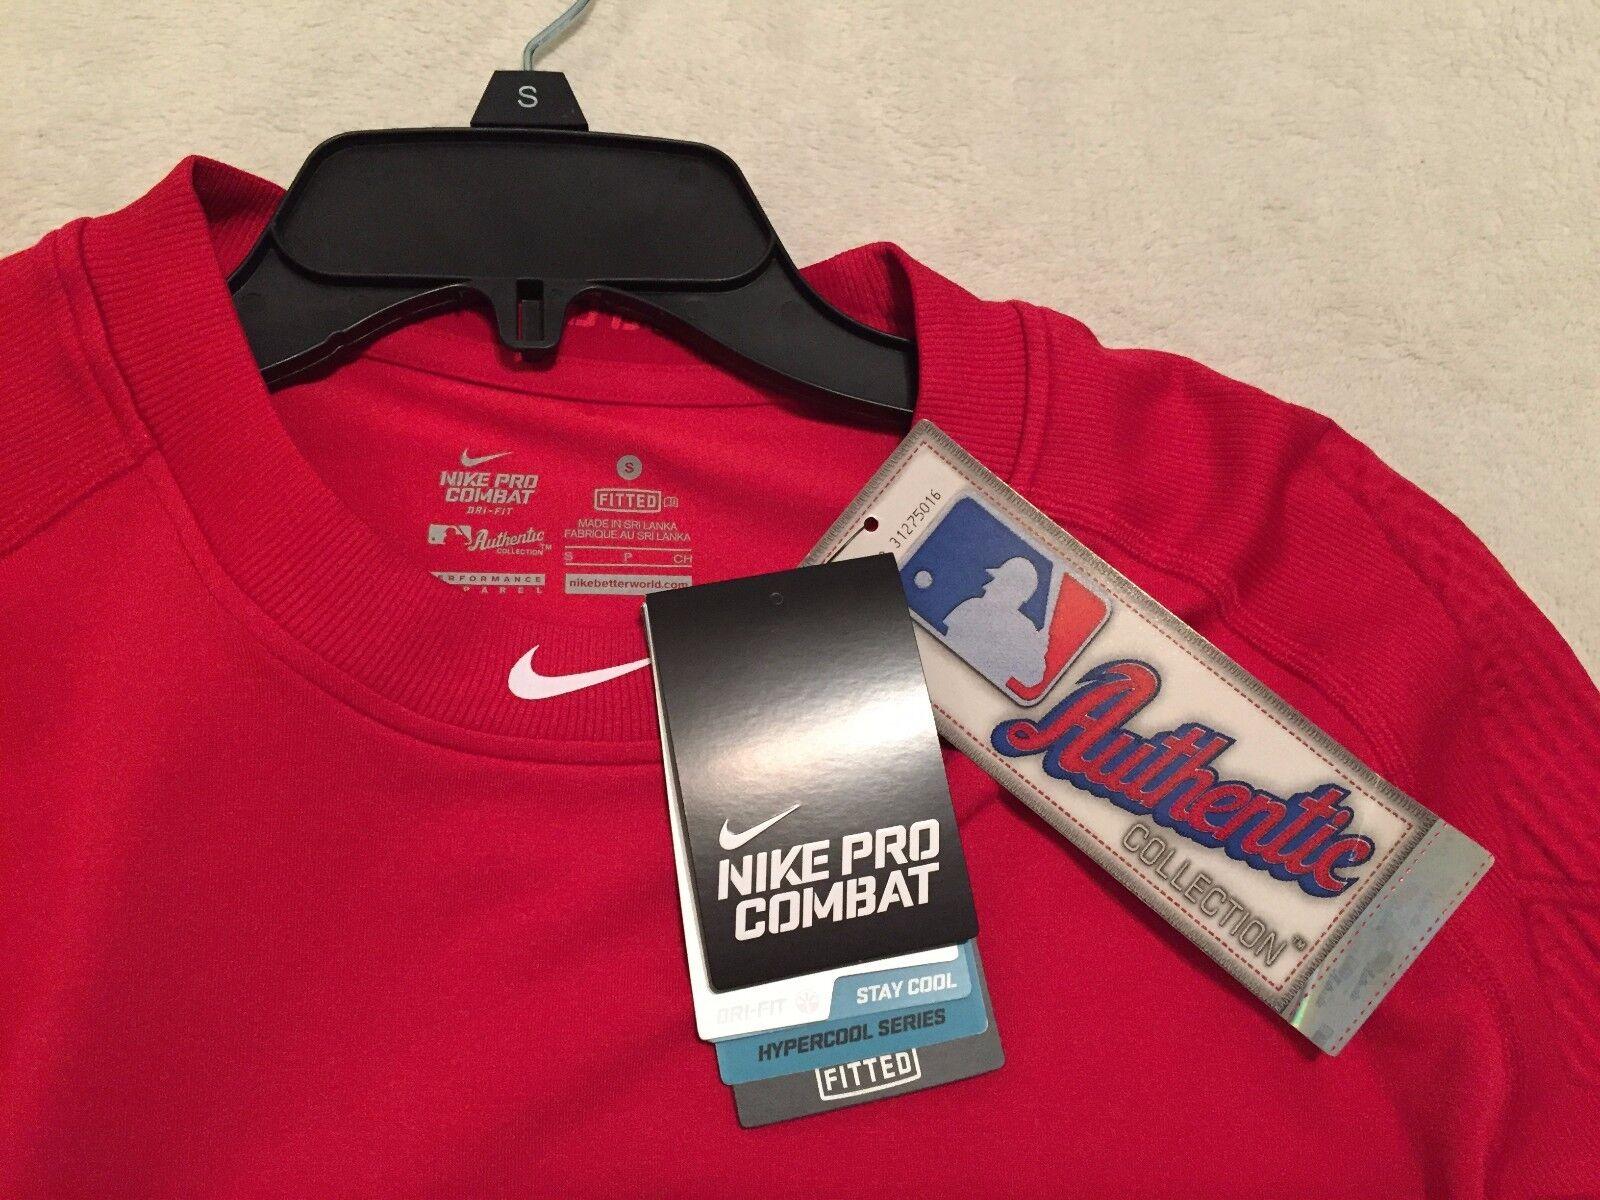 NIKE PRO COMBAT Men's Dri Fit HYPERCOOL Fitted Baseball Shirt Sz Small  NWT